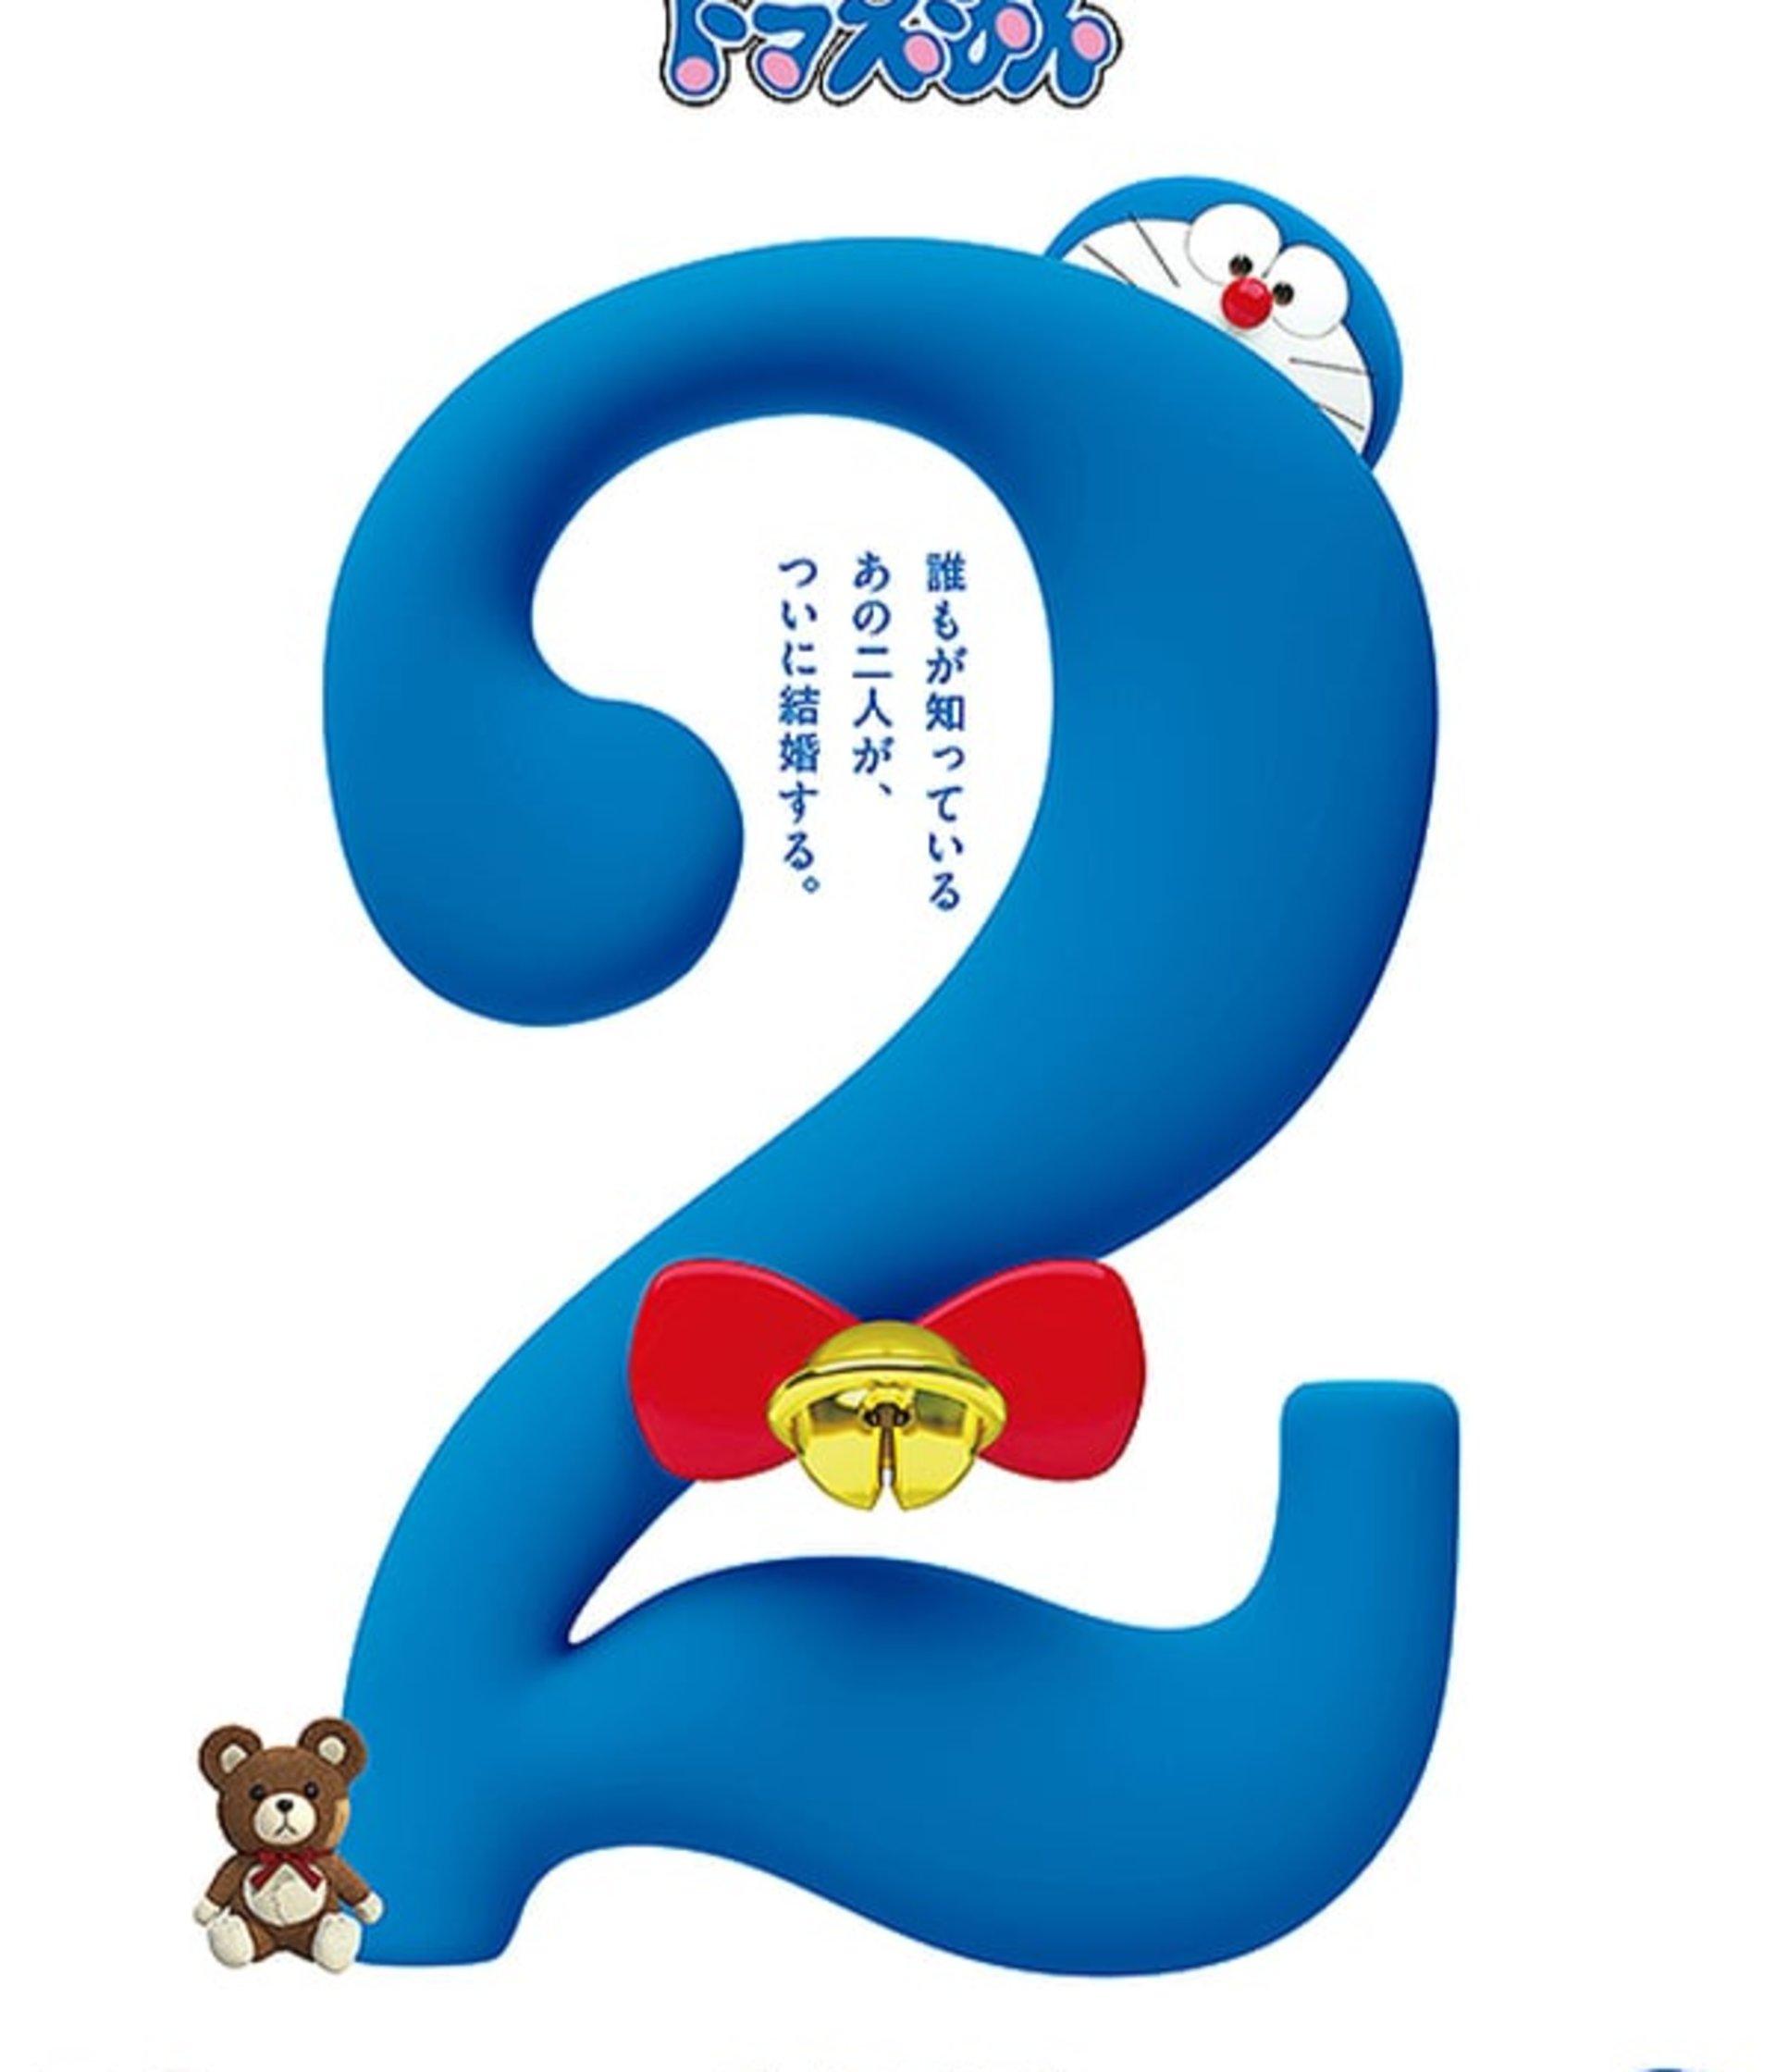 Nonton Film Stand By Me Doraemon 2 (2020) Sub Indo | LEBAH ...